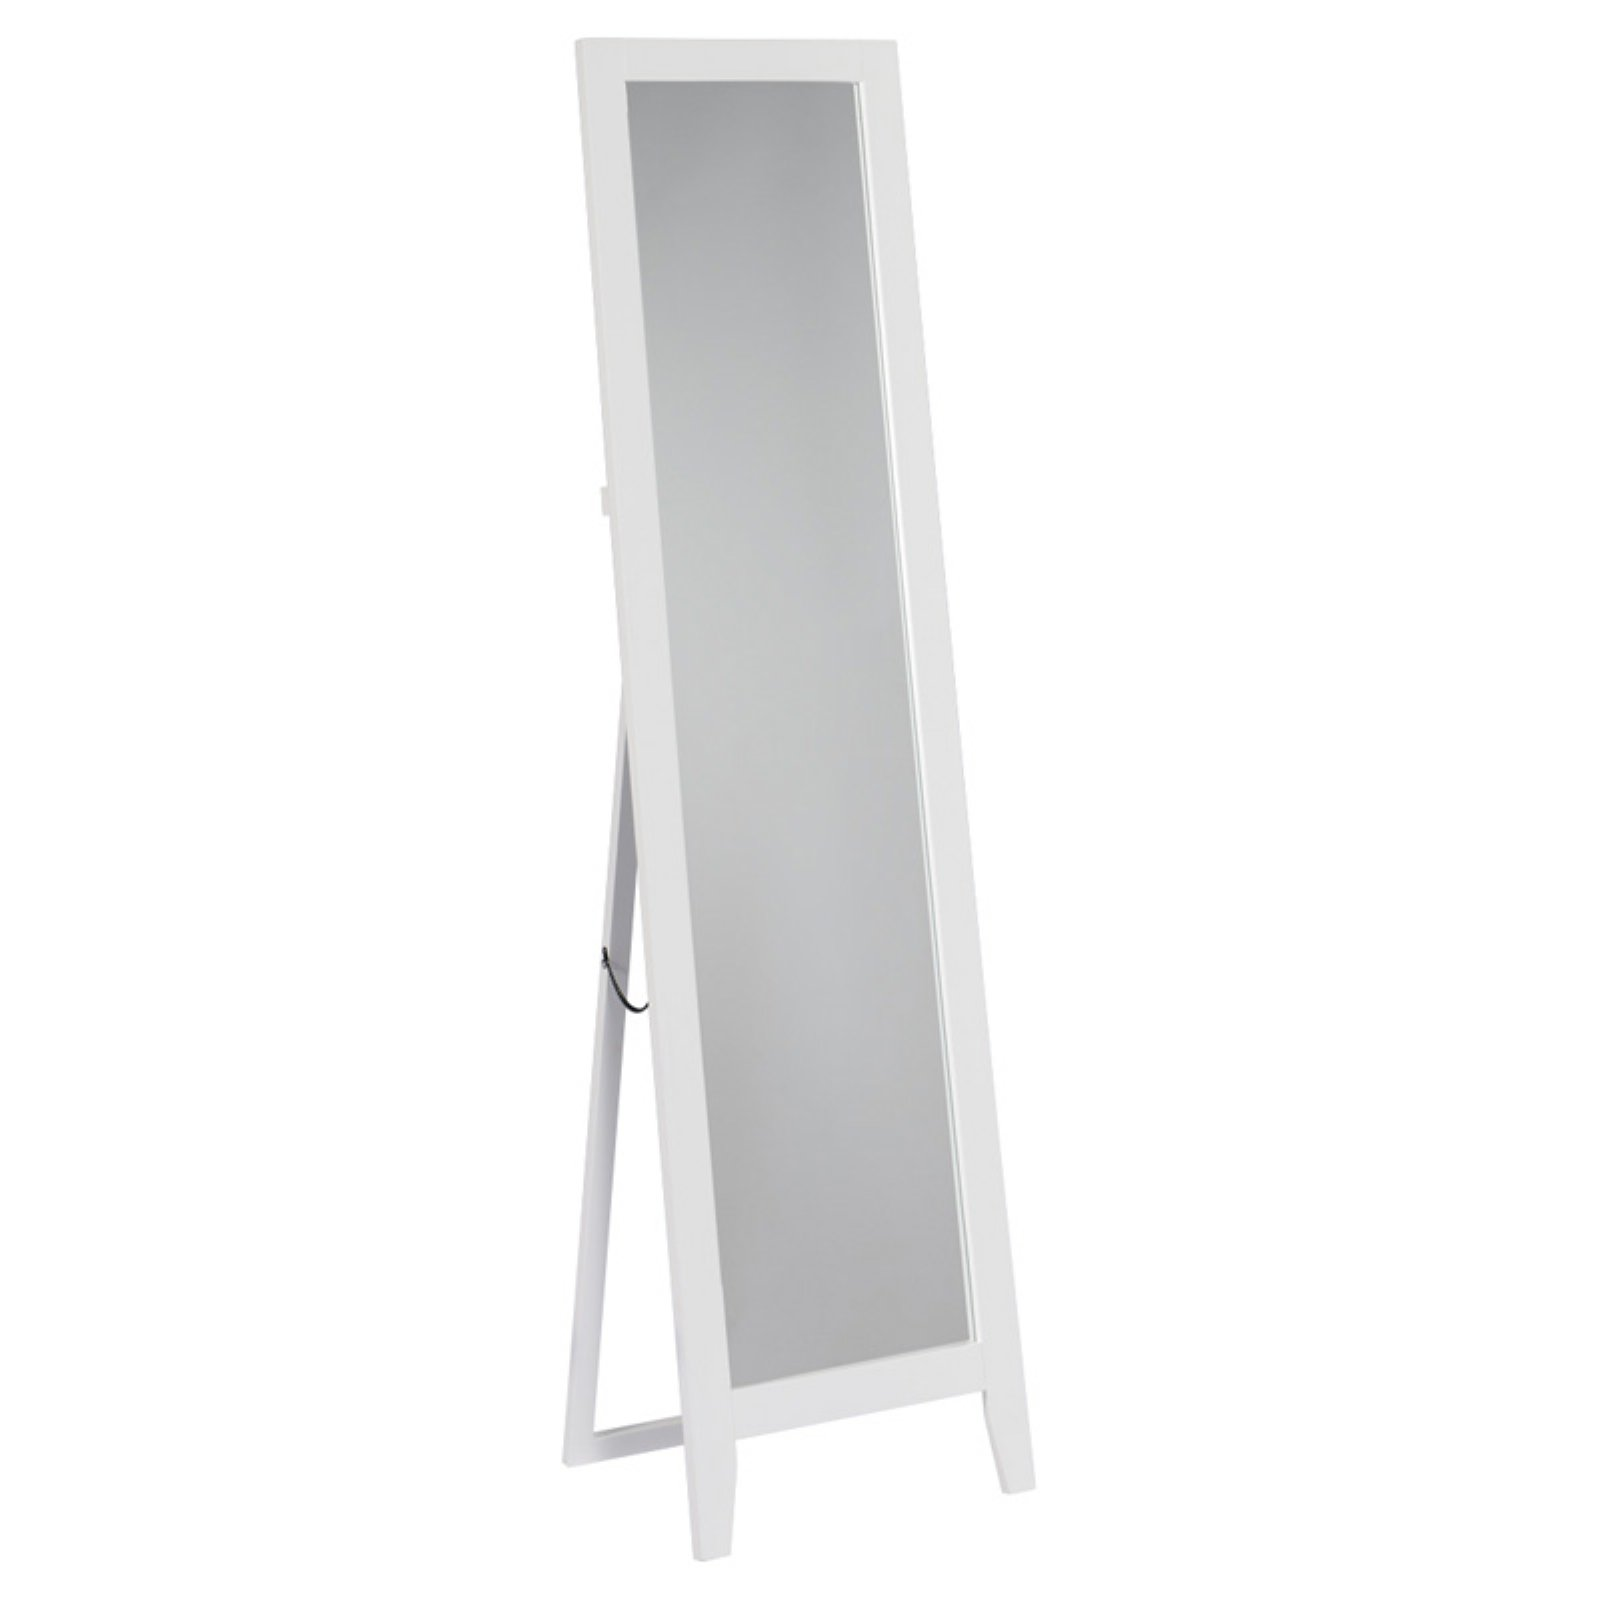 K ; B Furniture Rectangular Standing Mirror - 15W x 59H in.